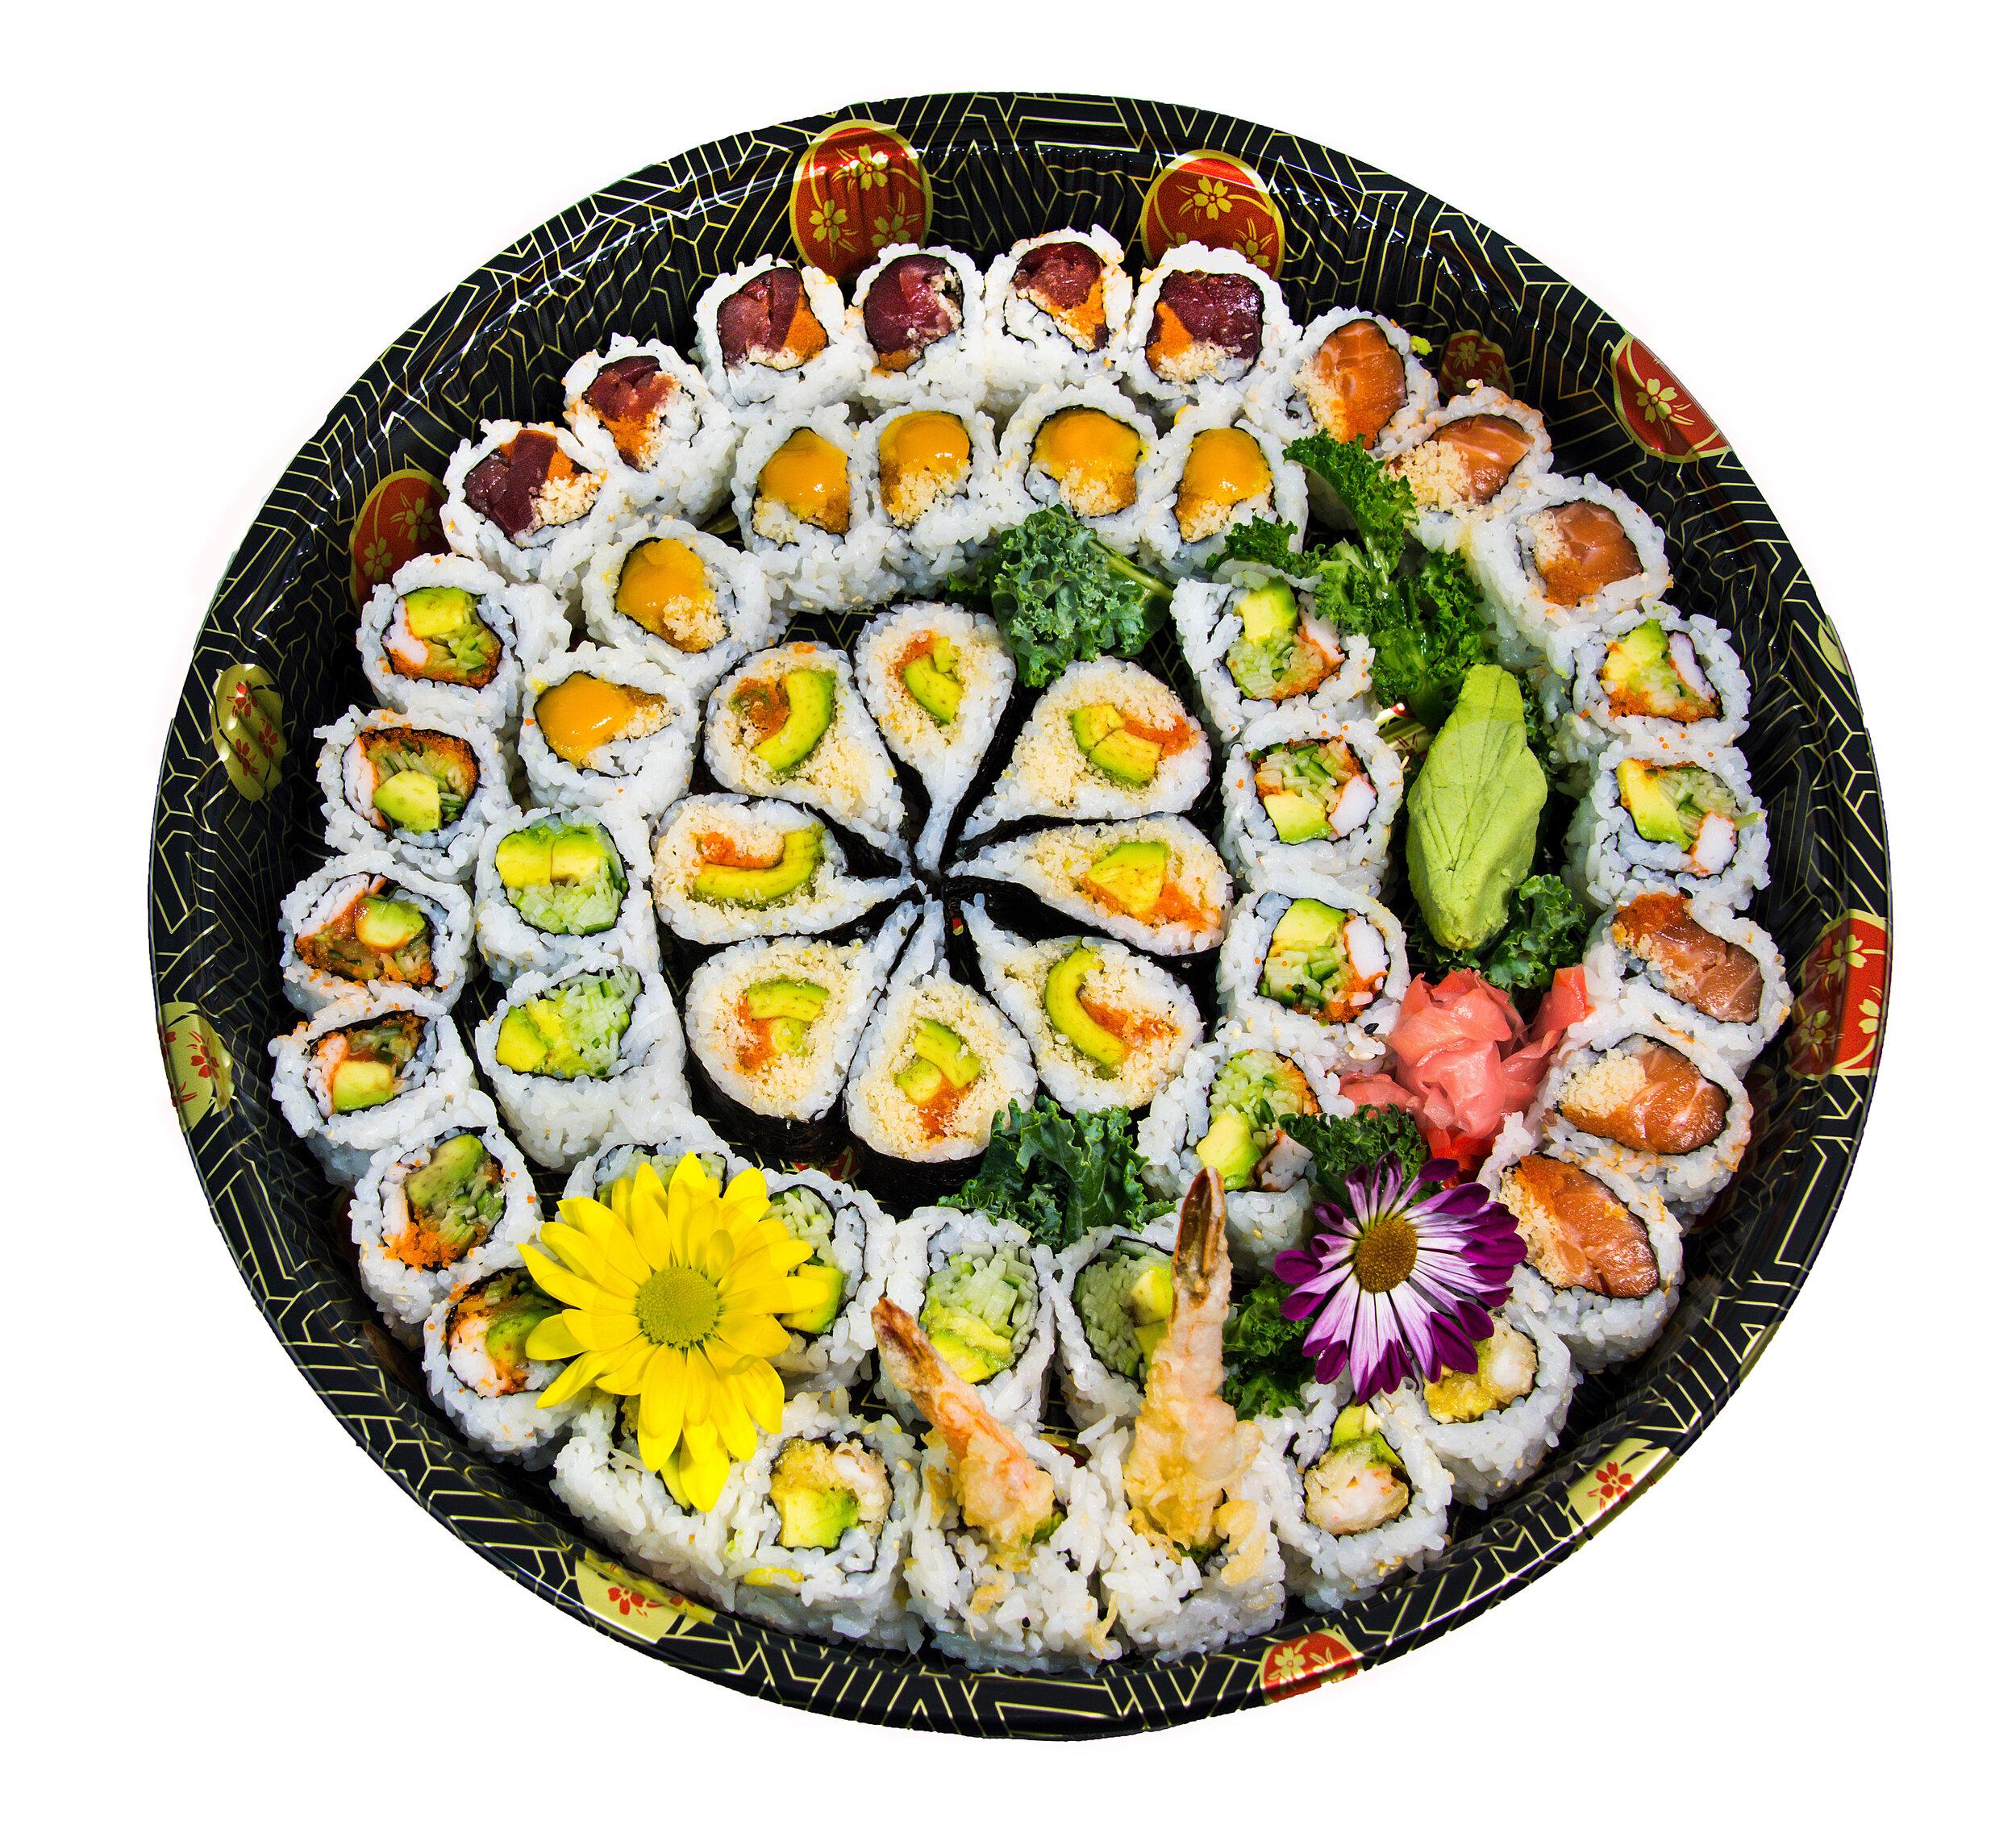 A9 Maki Tray (Large)    Spicy Salmon (6) Spicy Tuna (6) Kamikaze Roll (8) Dynamite (6) California (12) Mango Crispy (6) Cucumber Avocado (6)